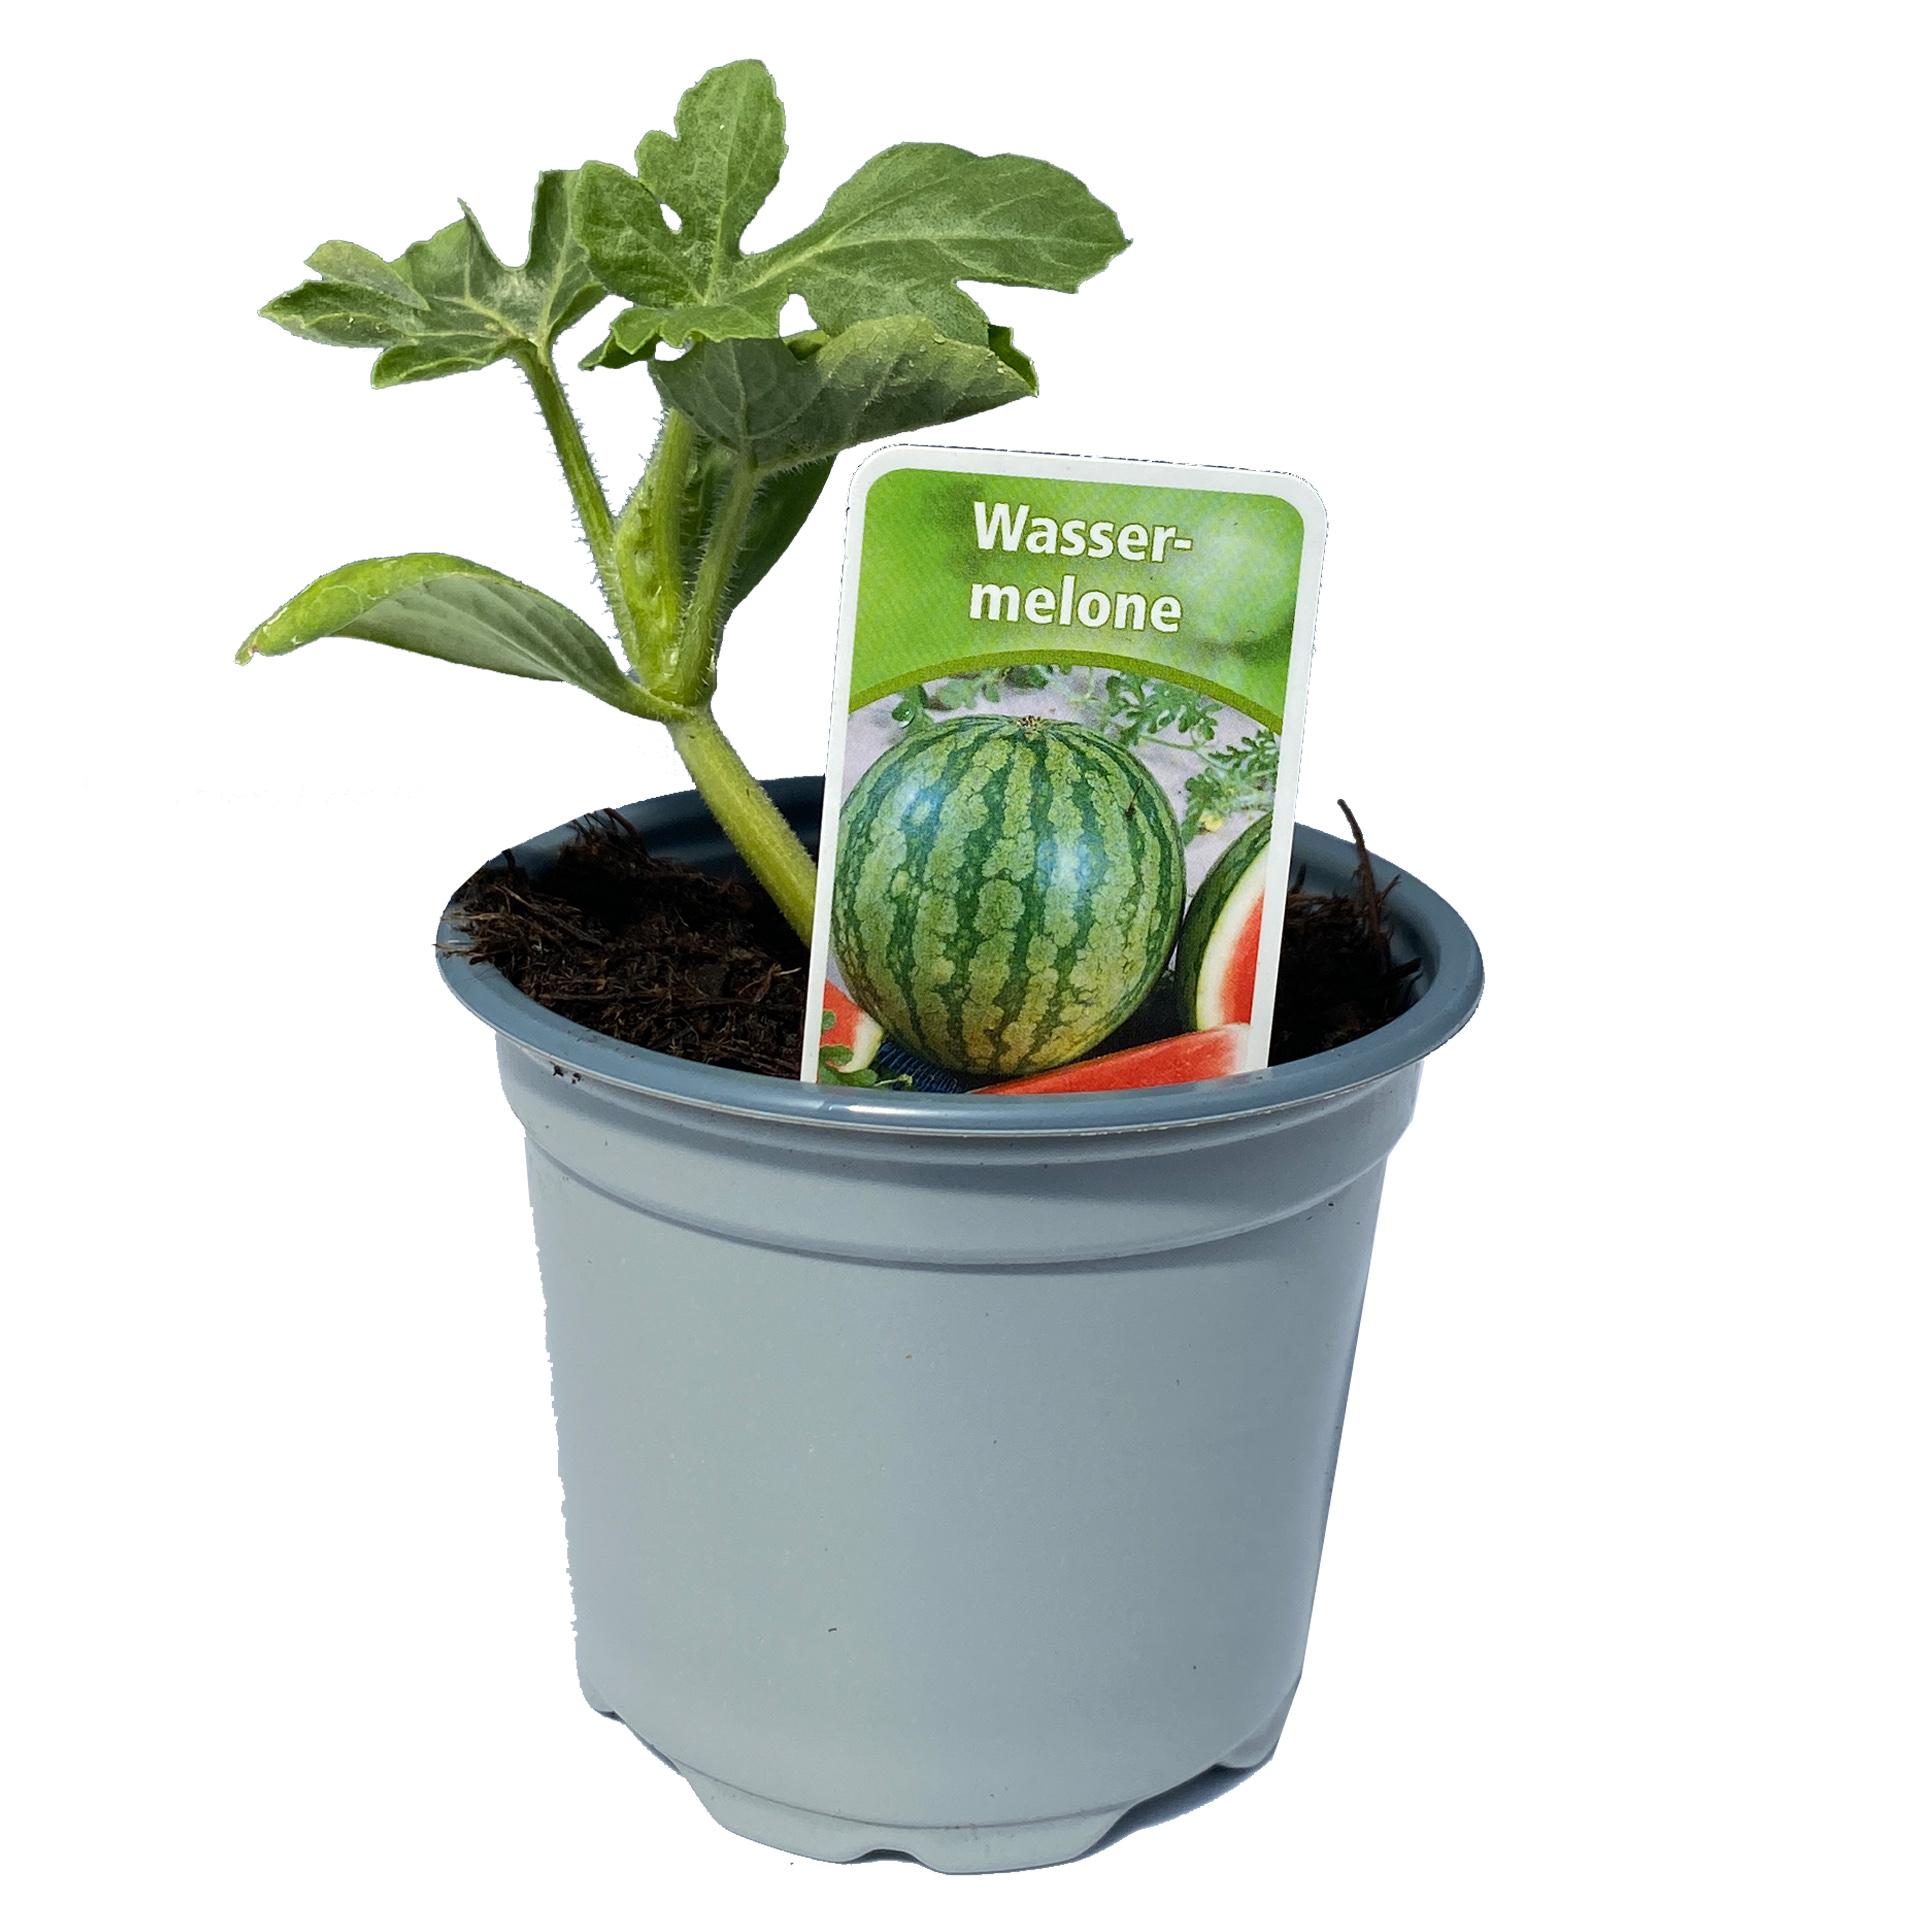 Wassermelonen - Melonenpflanze, 9cm Topf